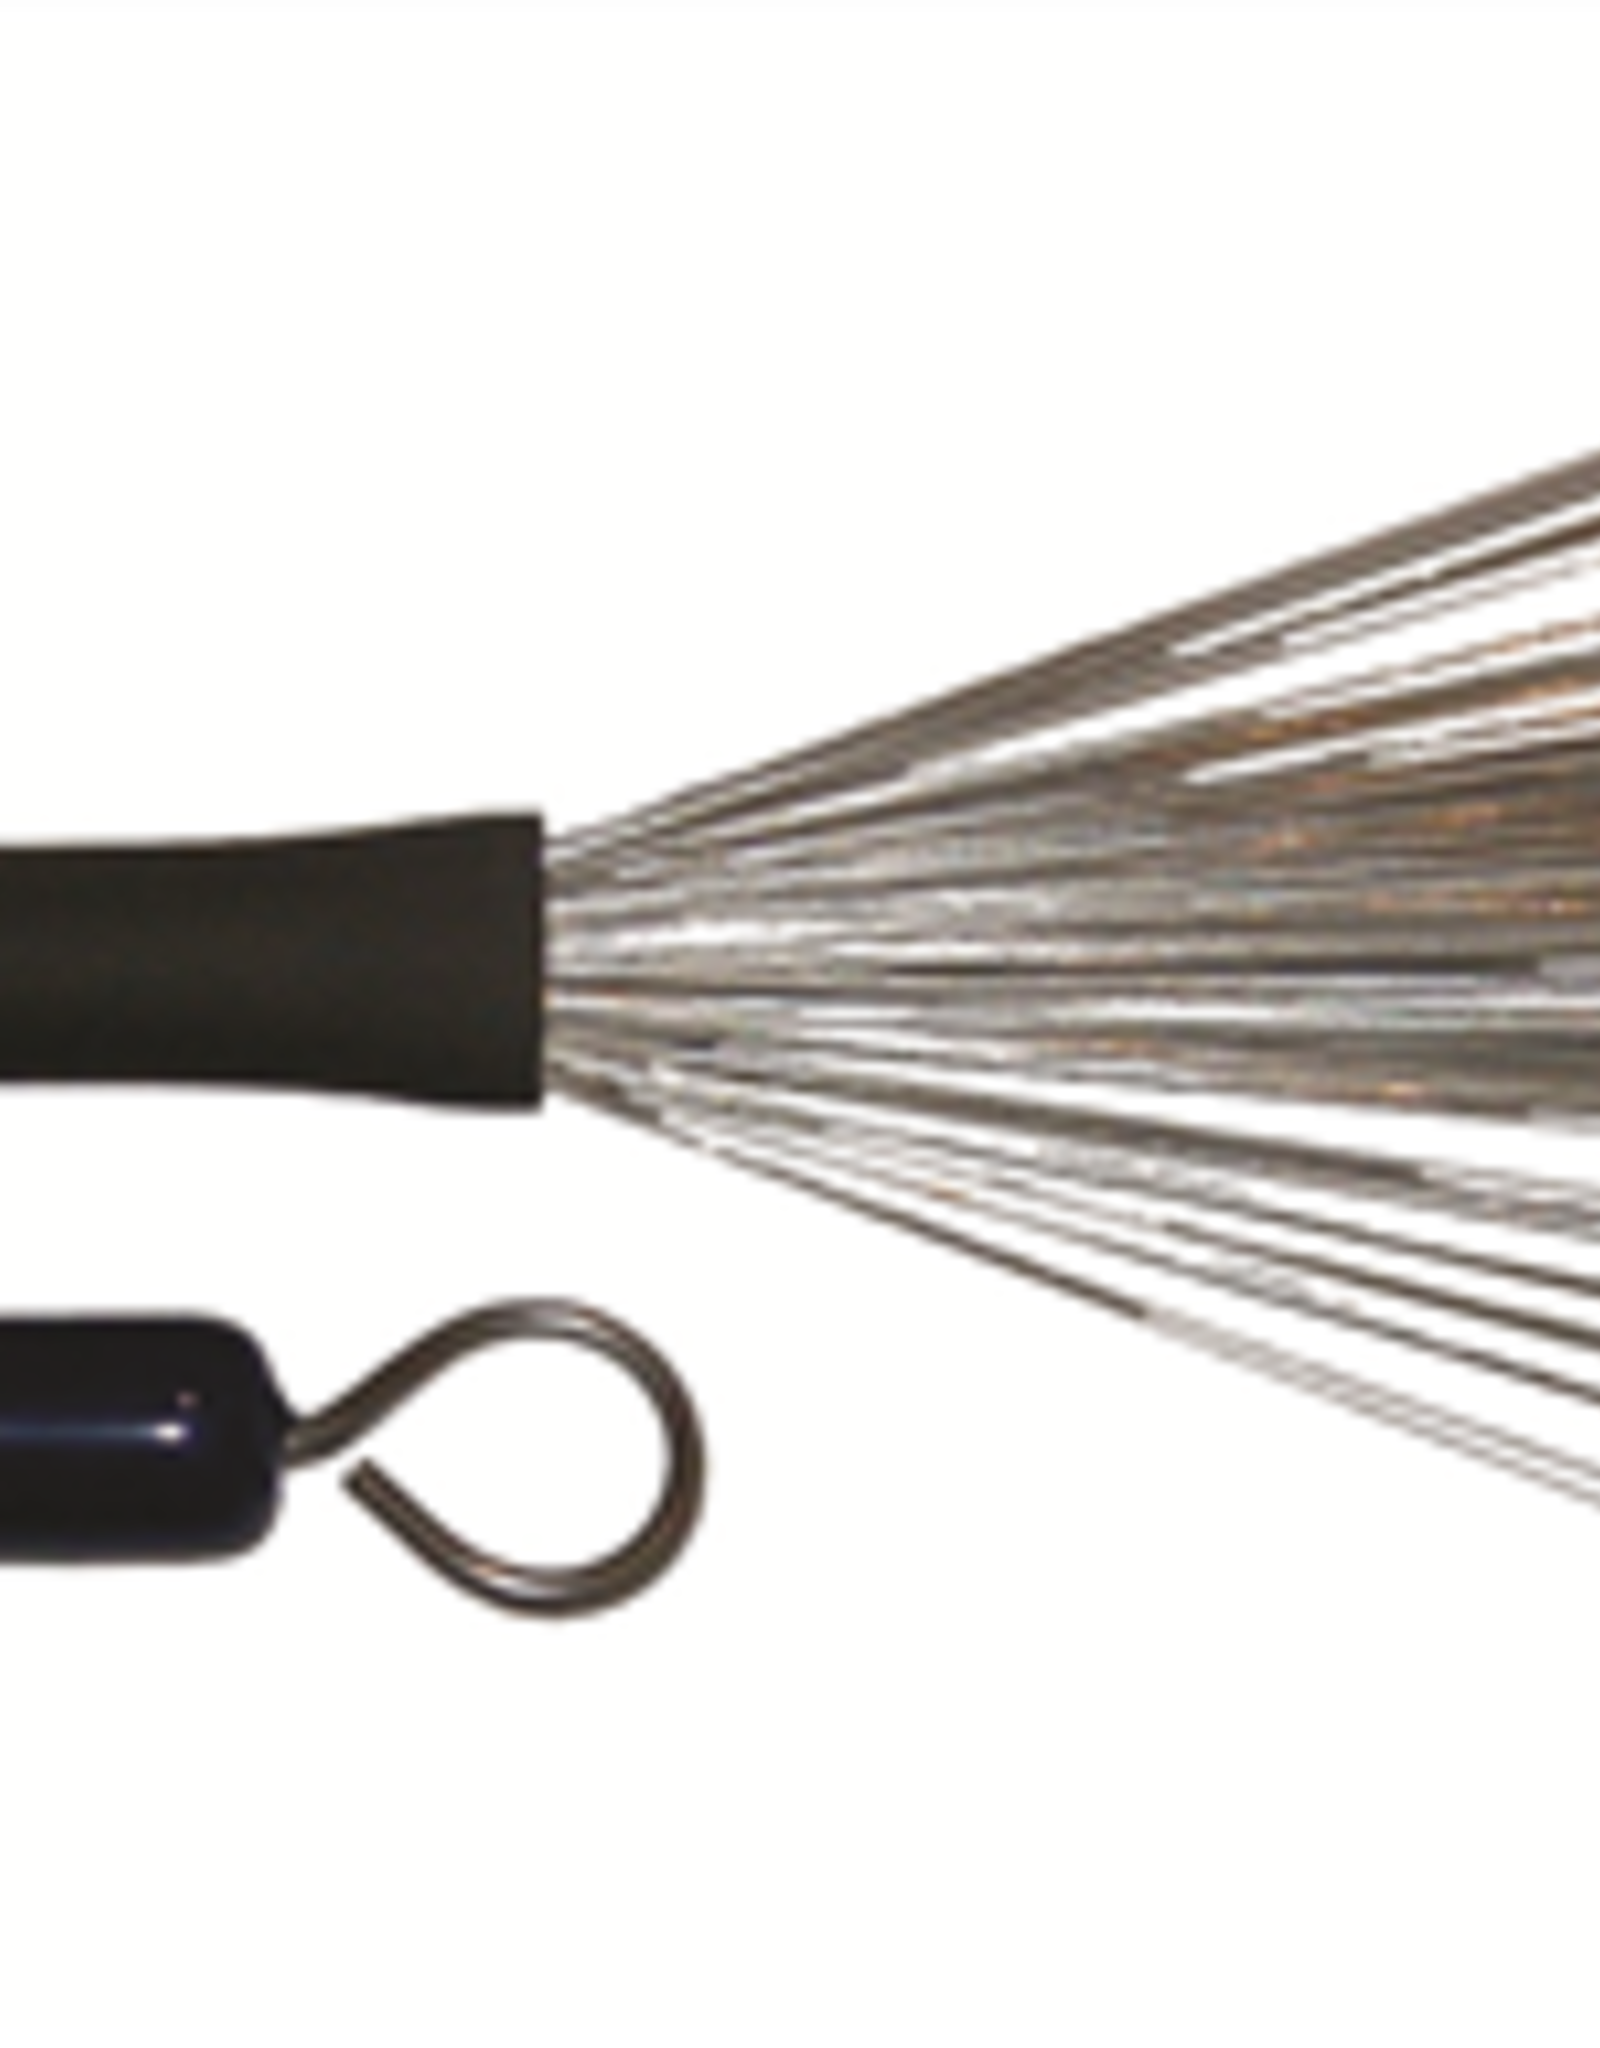 Promark Promark Steel Wire Brush